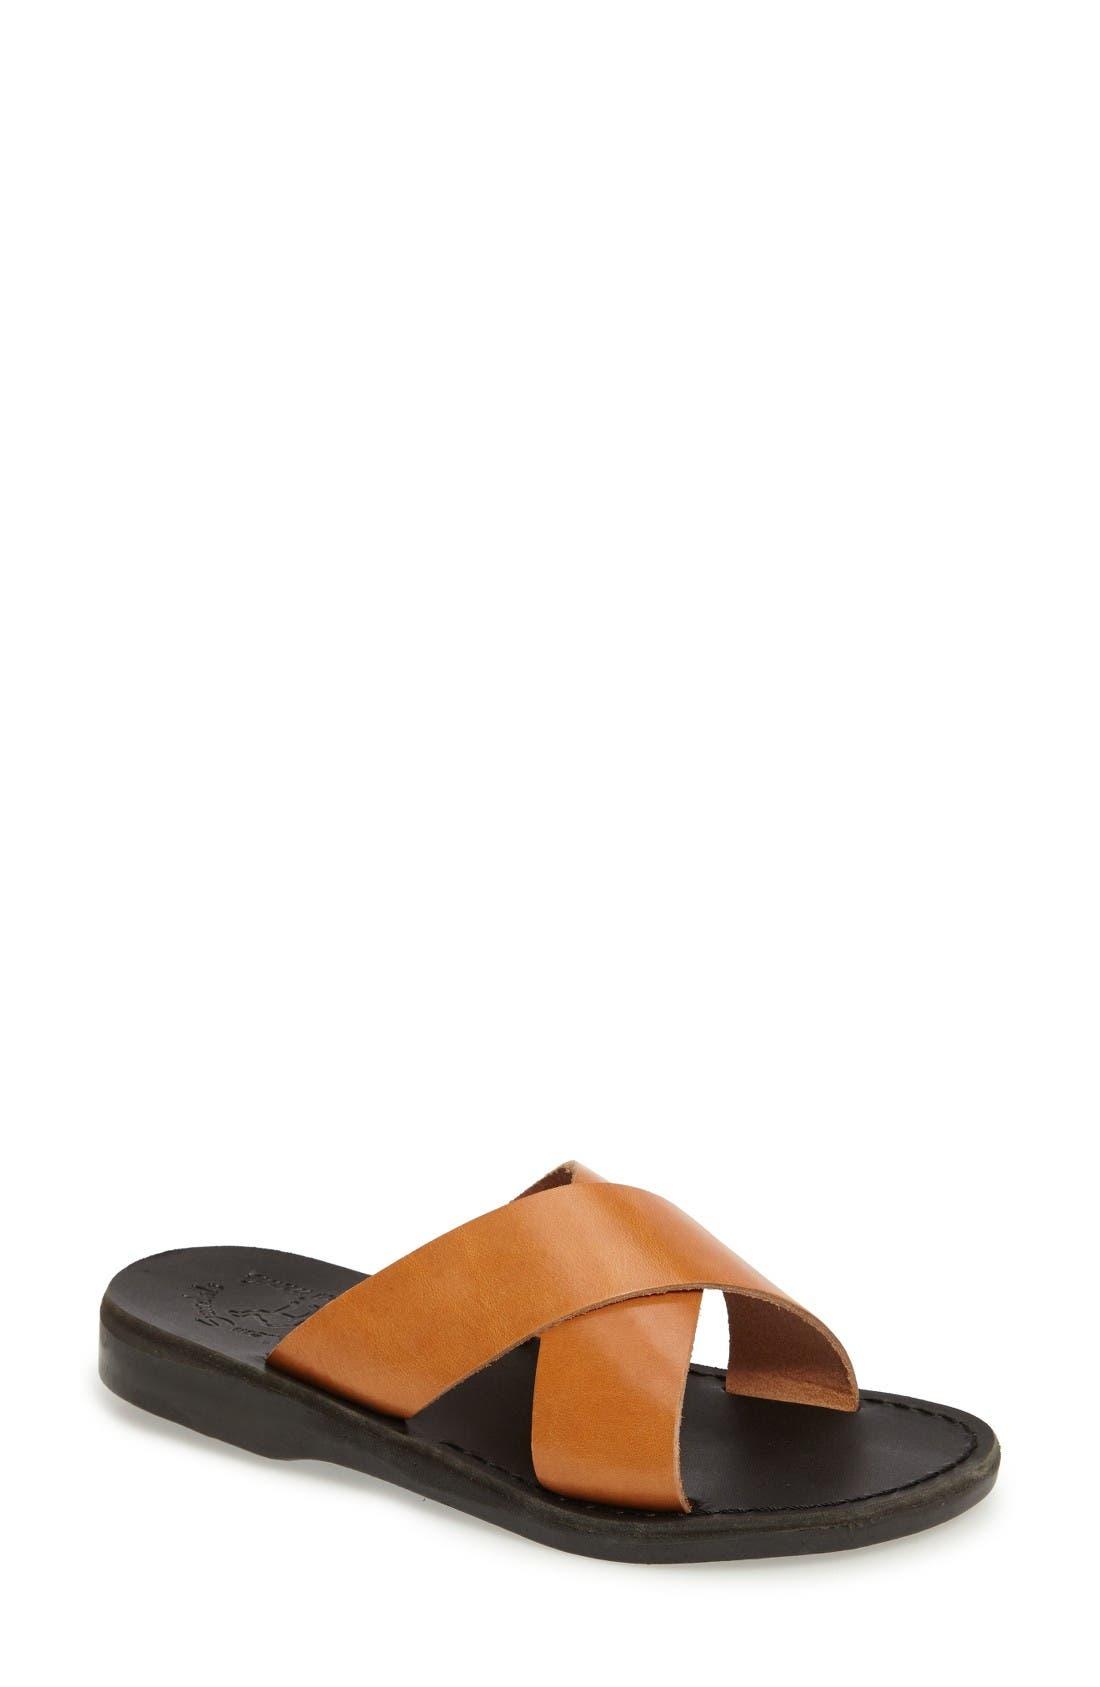 Elan Crisscross Sandal,                             Main thumbnail 1, color,                             Brown/ Tan Leather